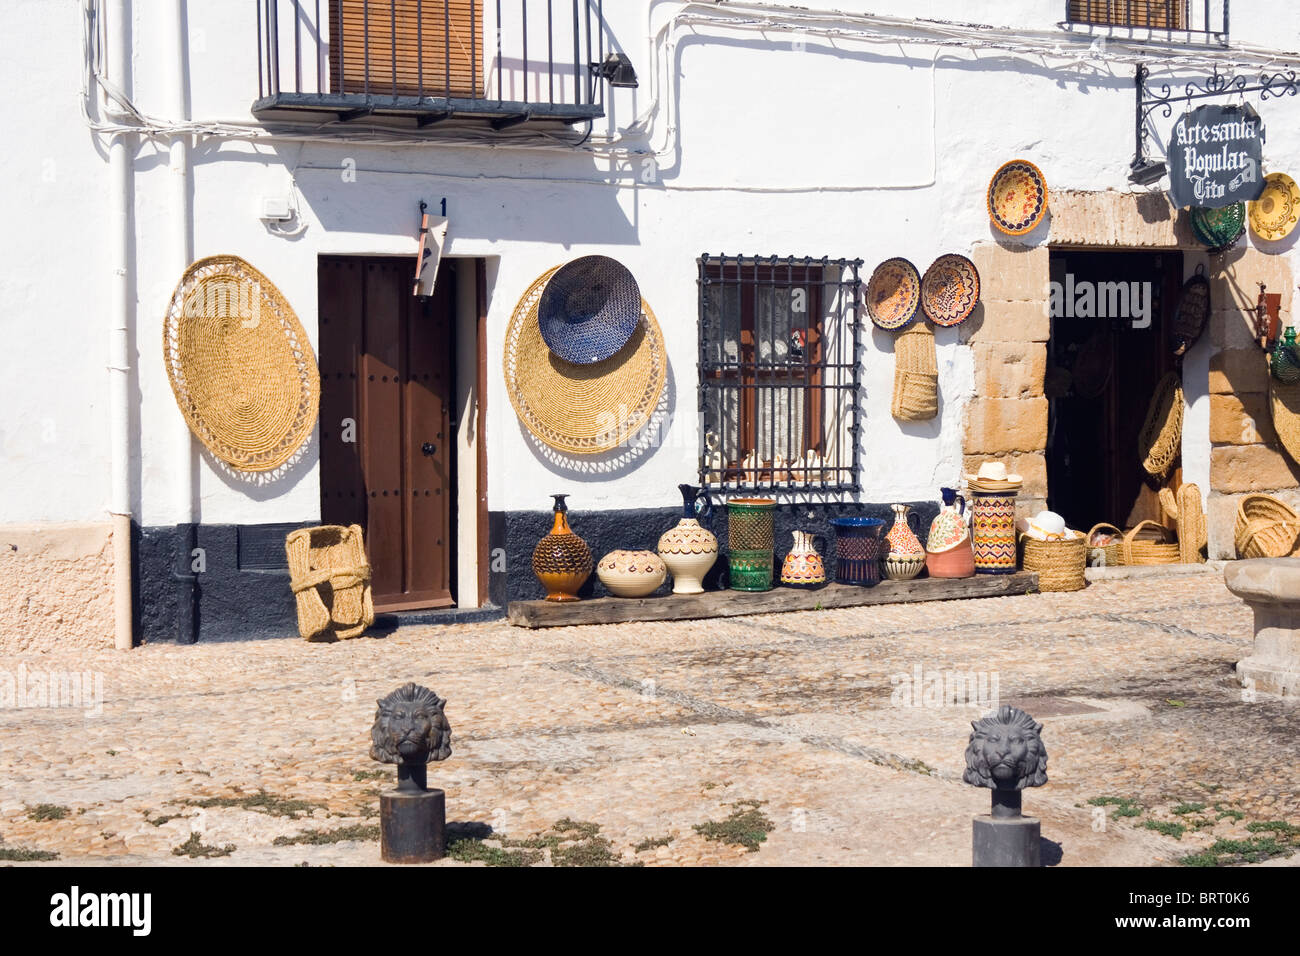 Ubeda, Jaen Province, Spain. Baskets and pottery outside souvenir shop. - Stock Image